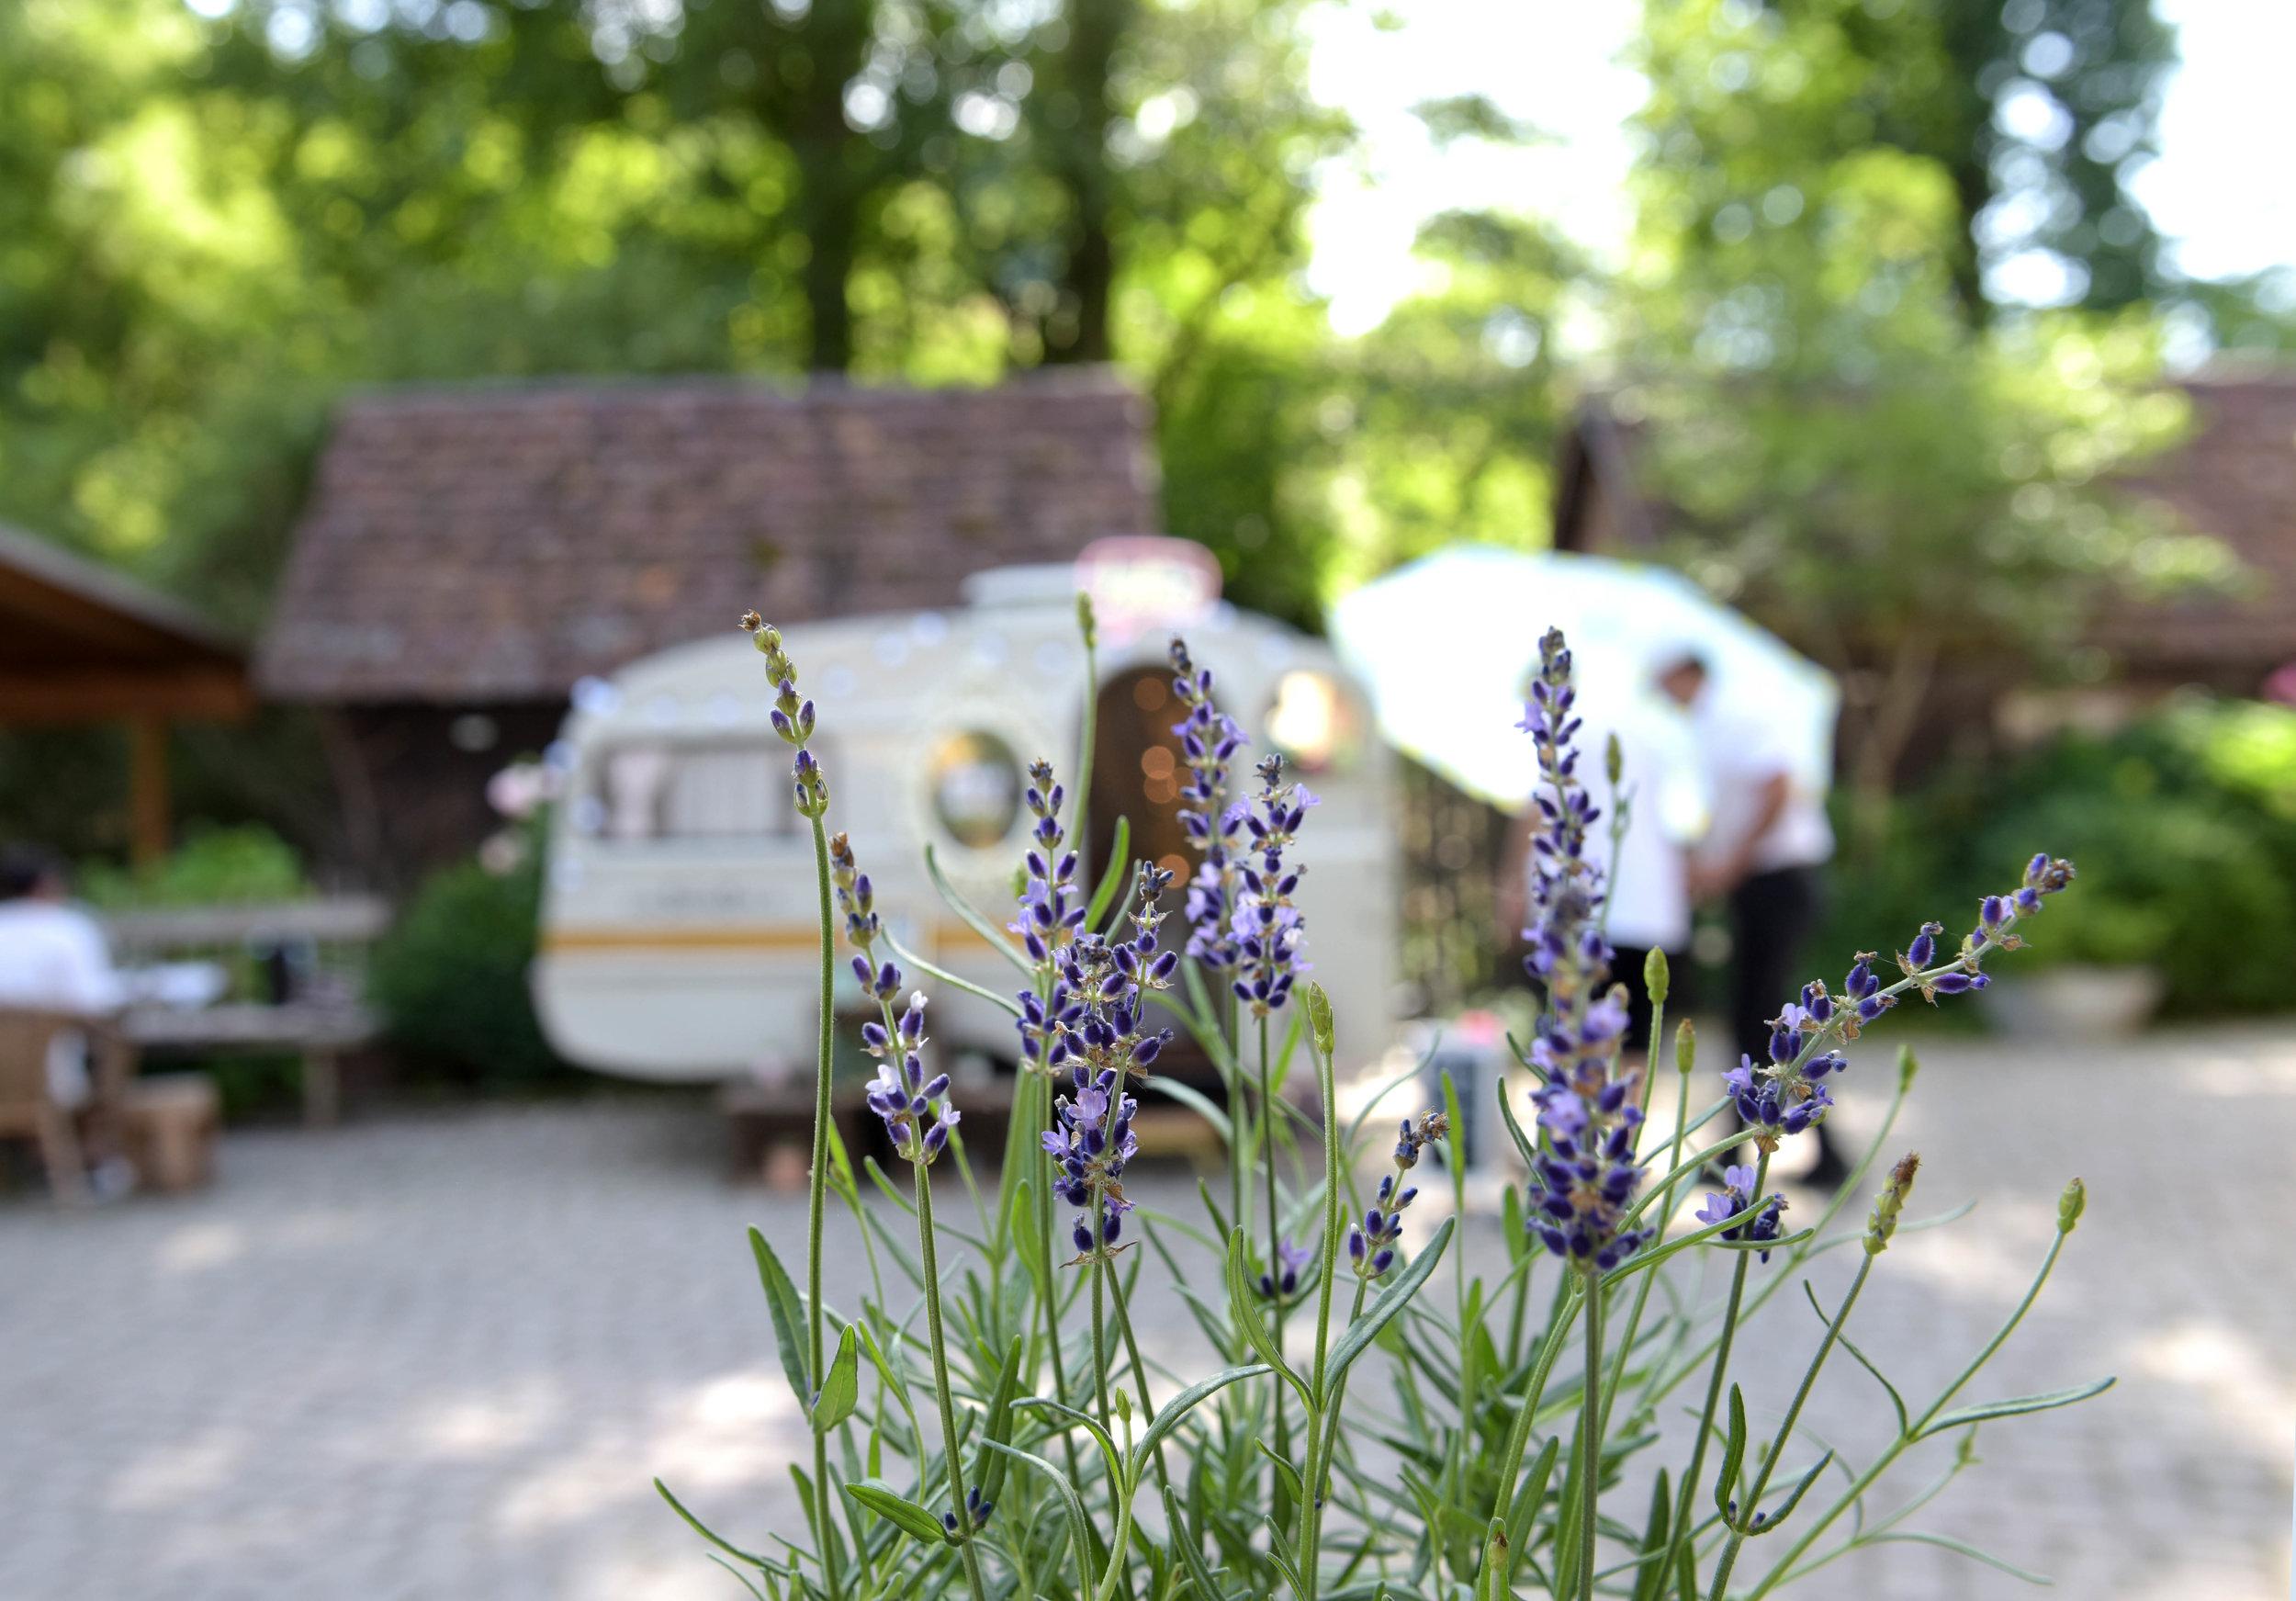 Caravan-Eselsmühle-Bäämely03.jpg